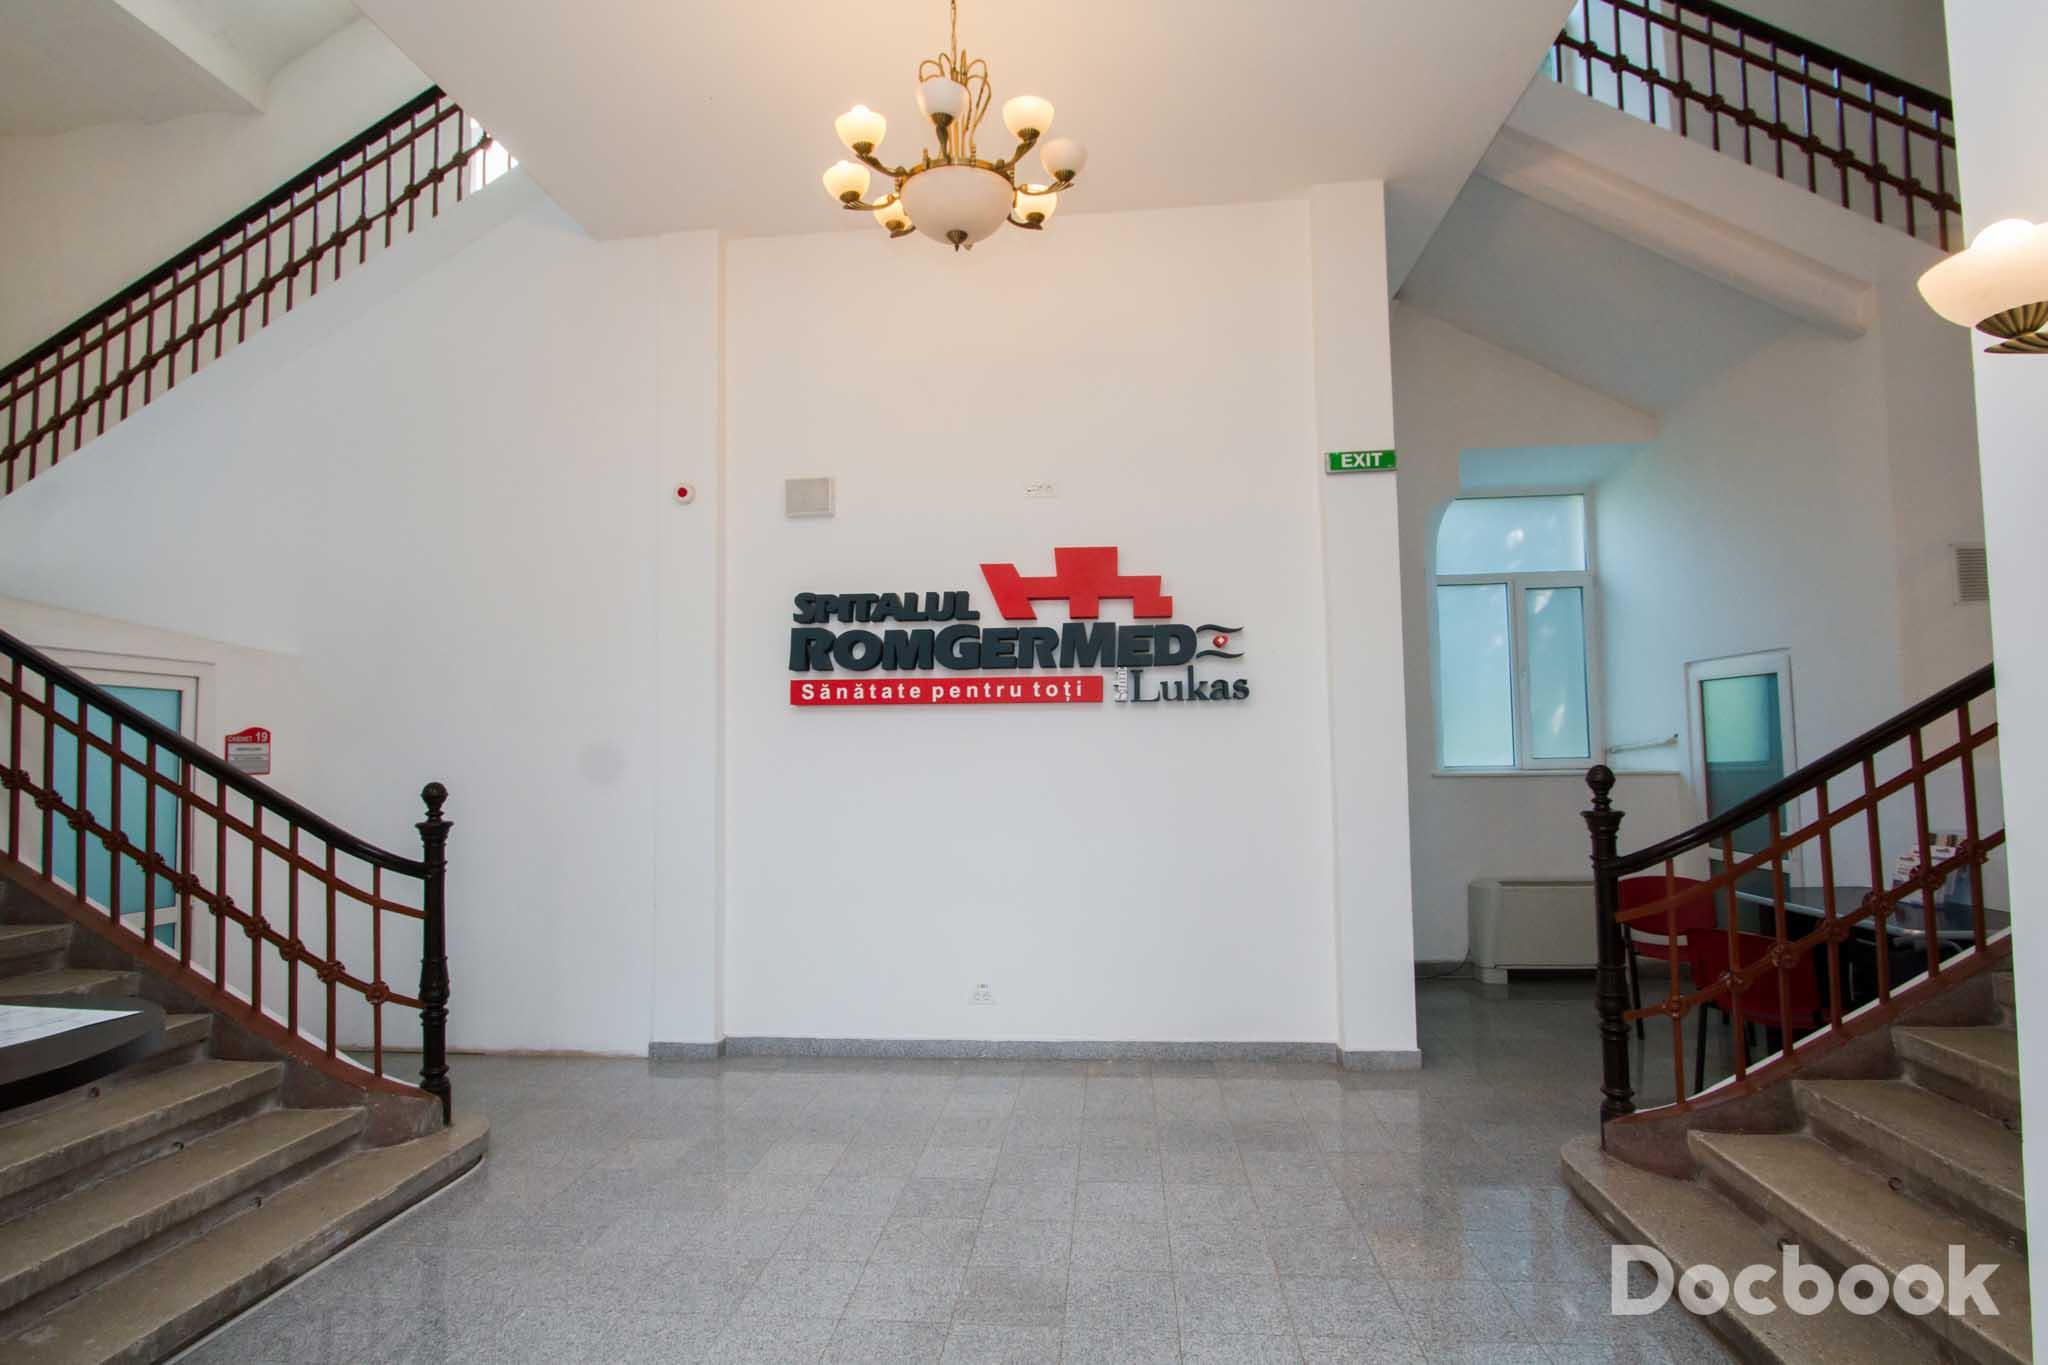 Clinica Saint Lukas